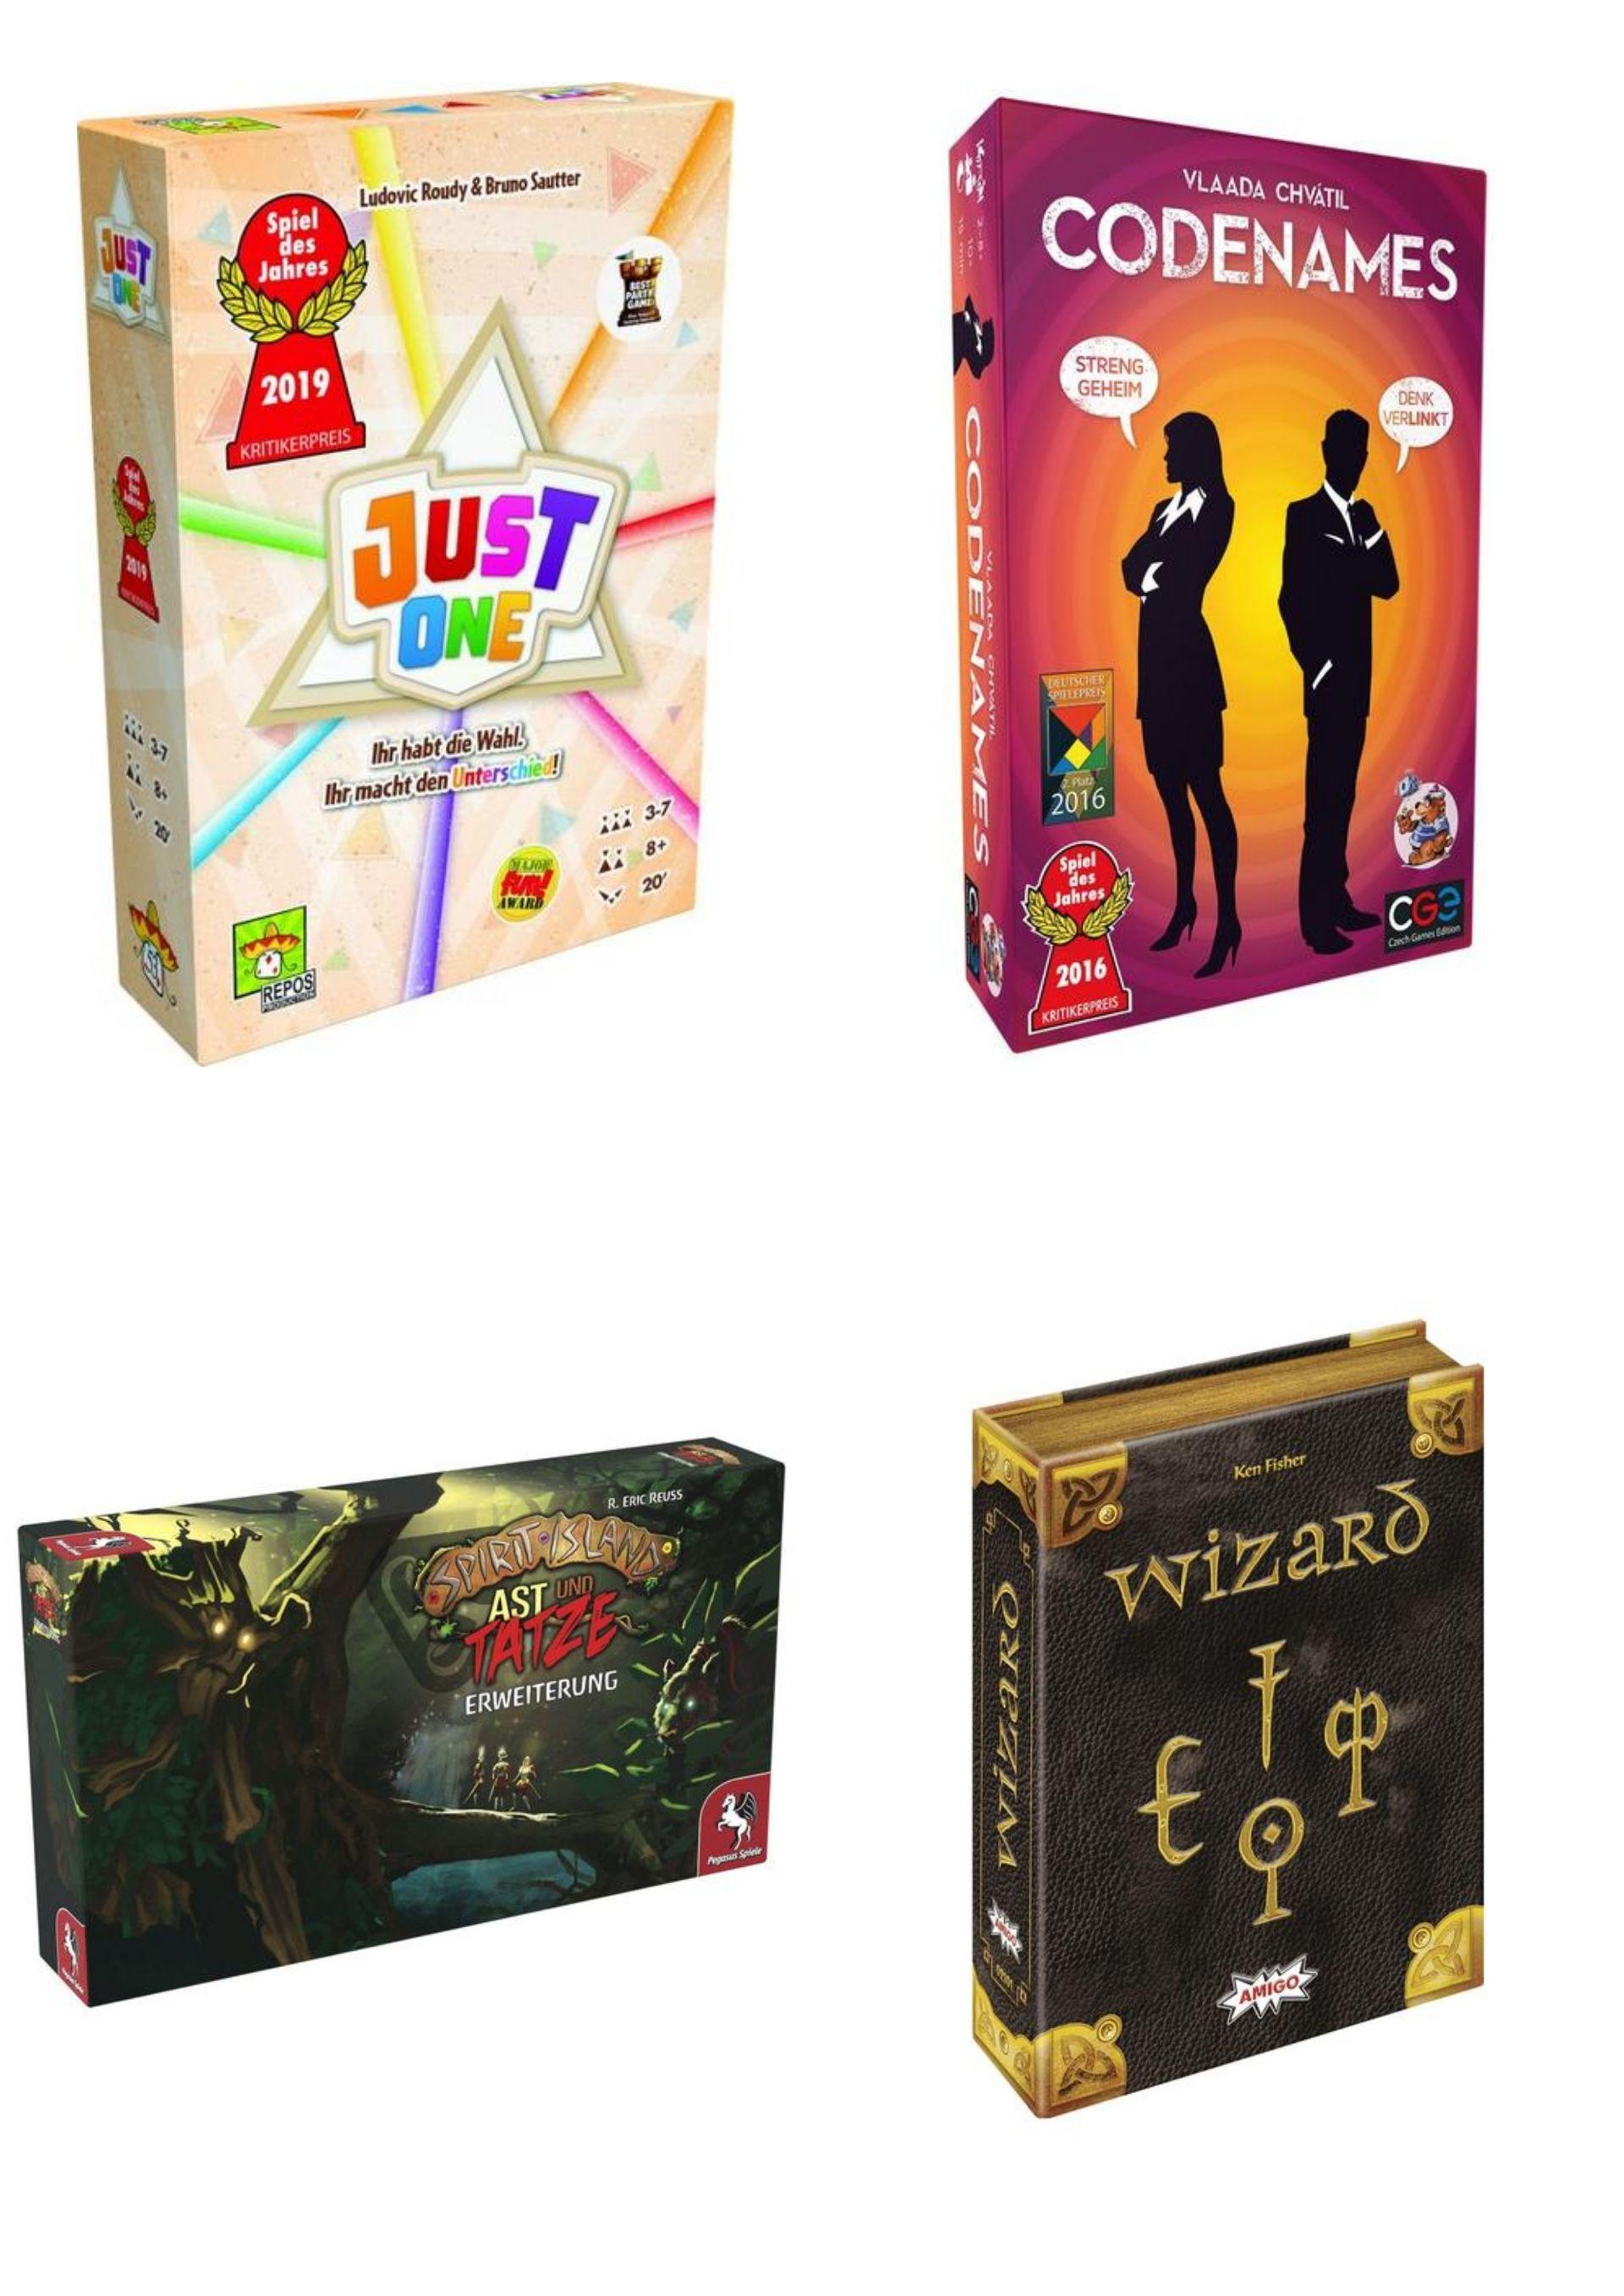 Brettspiel Sammeldeal bei Bol.de, z.B Just One (14,42€), Codenames (13,72€), Wizard Jub.ed. (16,29€), Spirit Island Erw. (17,14€)